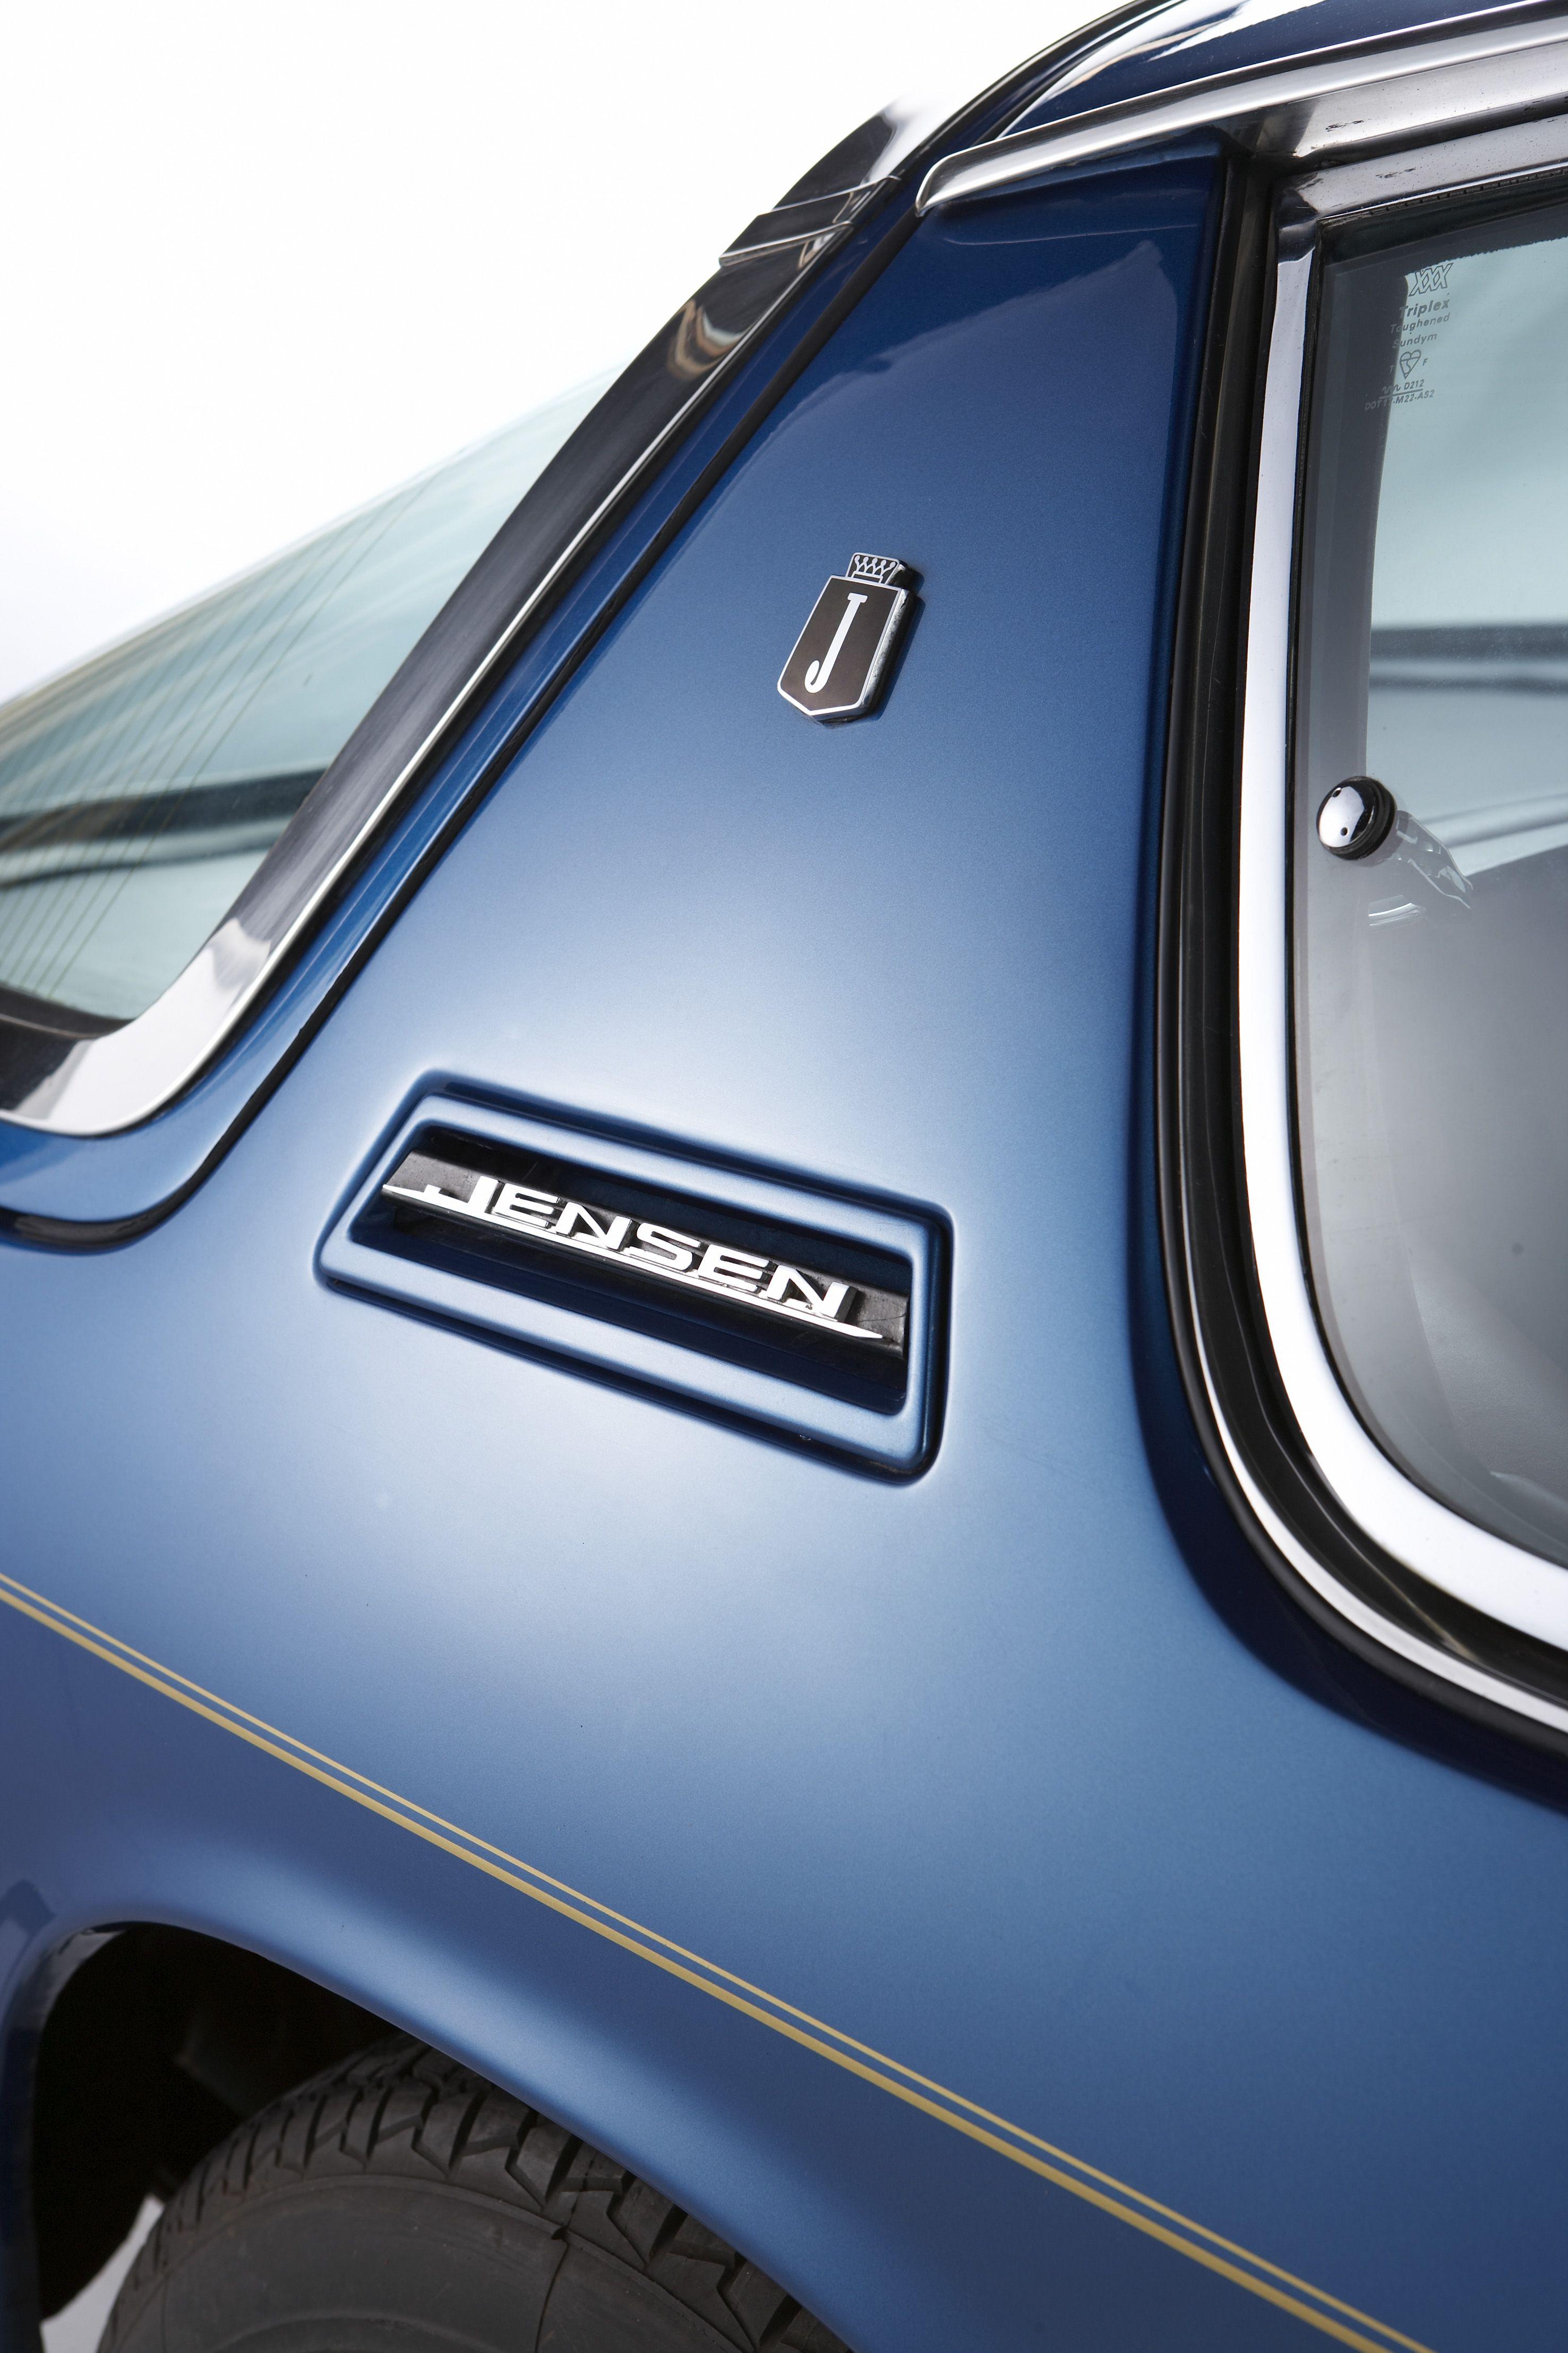 jensen interceptor car blue favorite classic cars pinterest cars british car and wheels. Black Bedroom Furniture Sets. Home Design Ideas